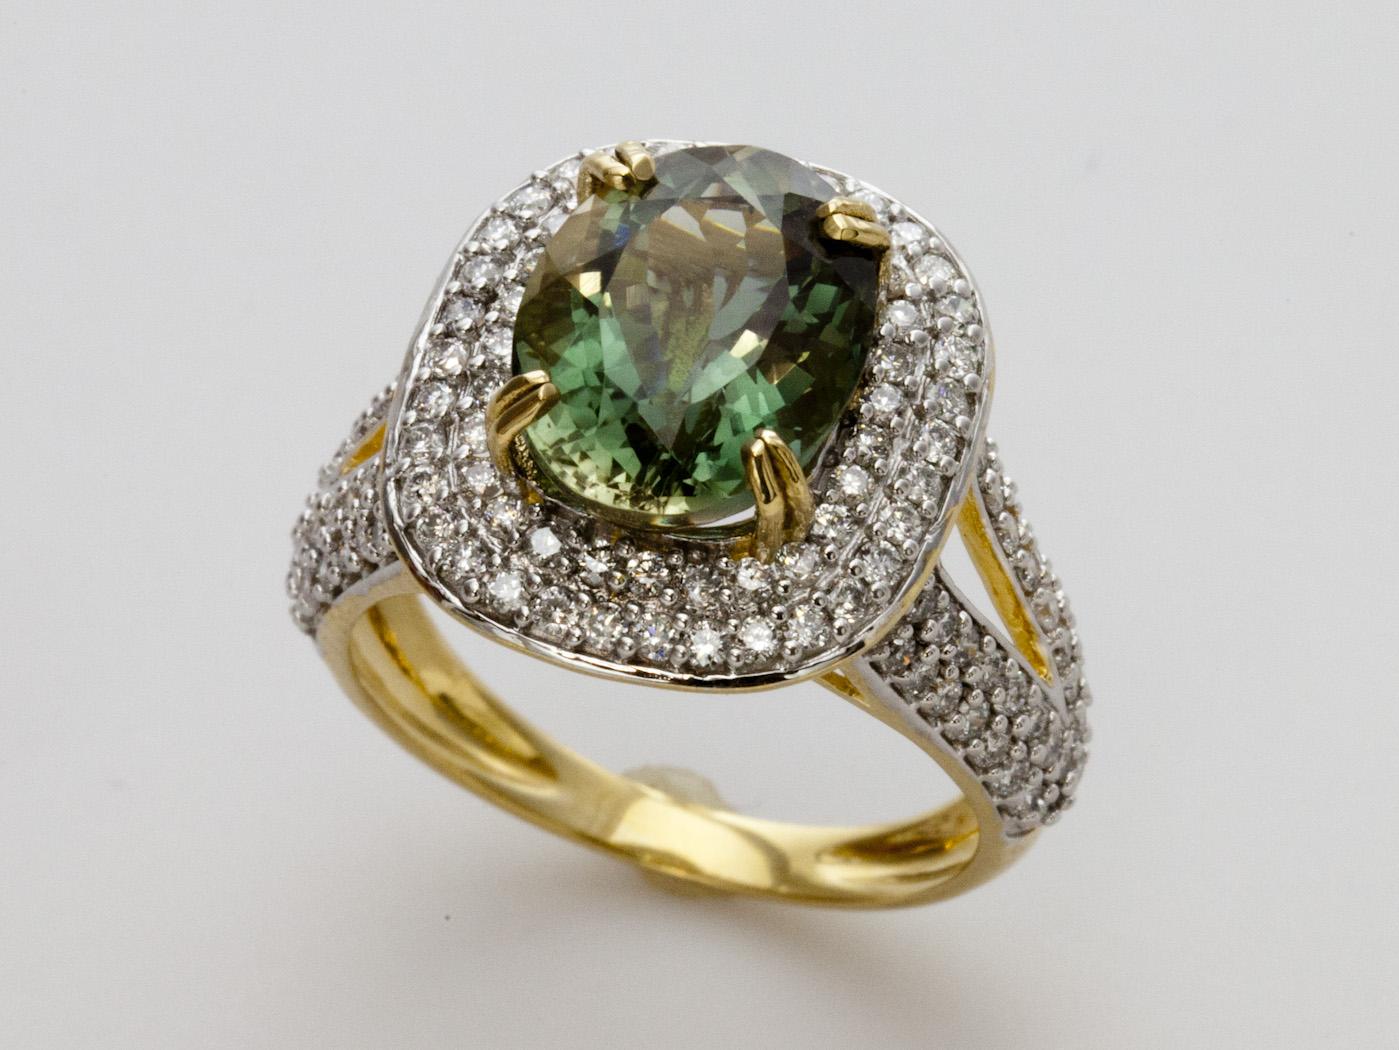 green sunstone gold ring with diamonds. Black Bedroom Furniture Sets. Home Design Ideas